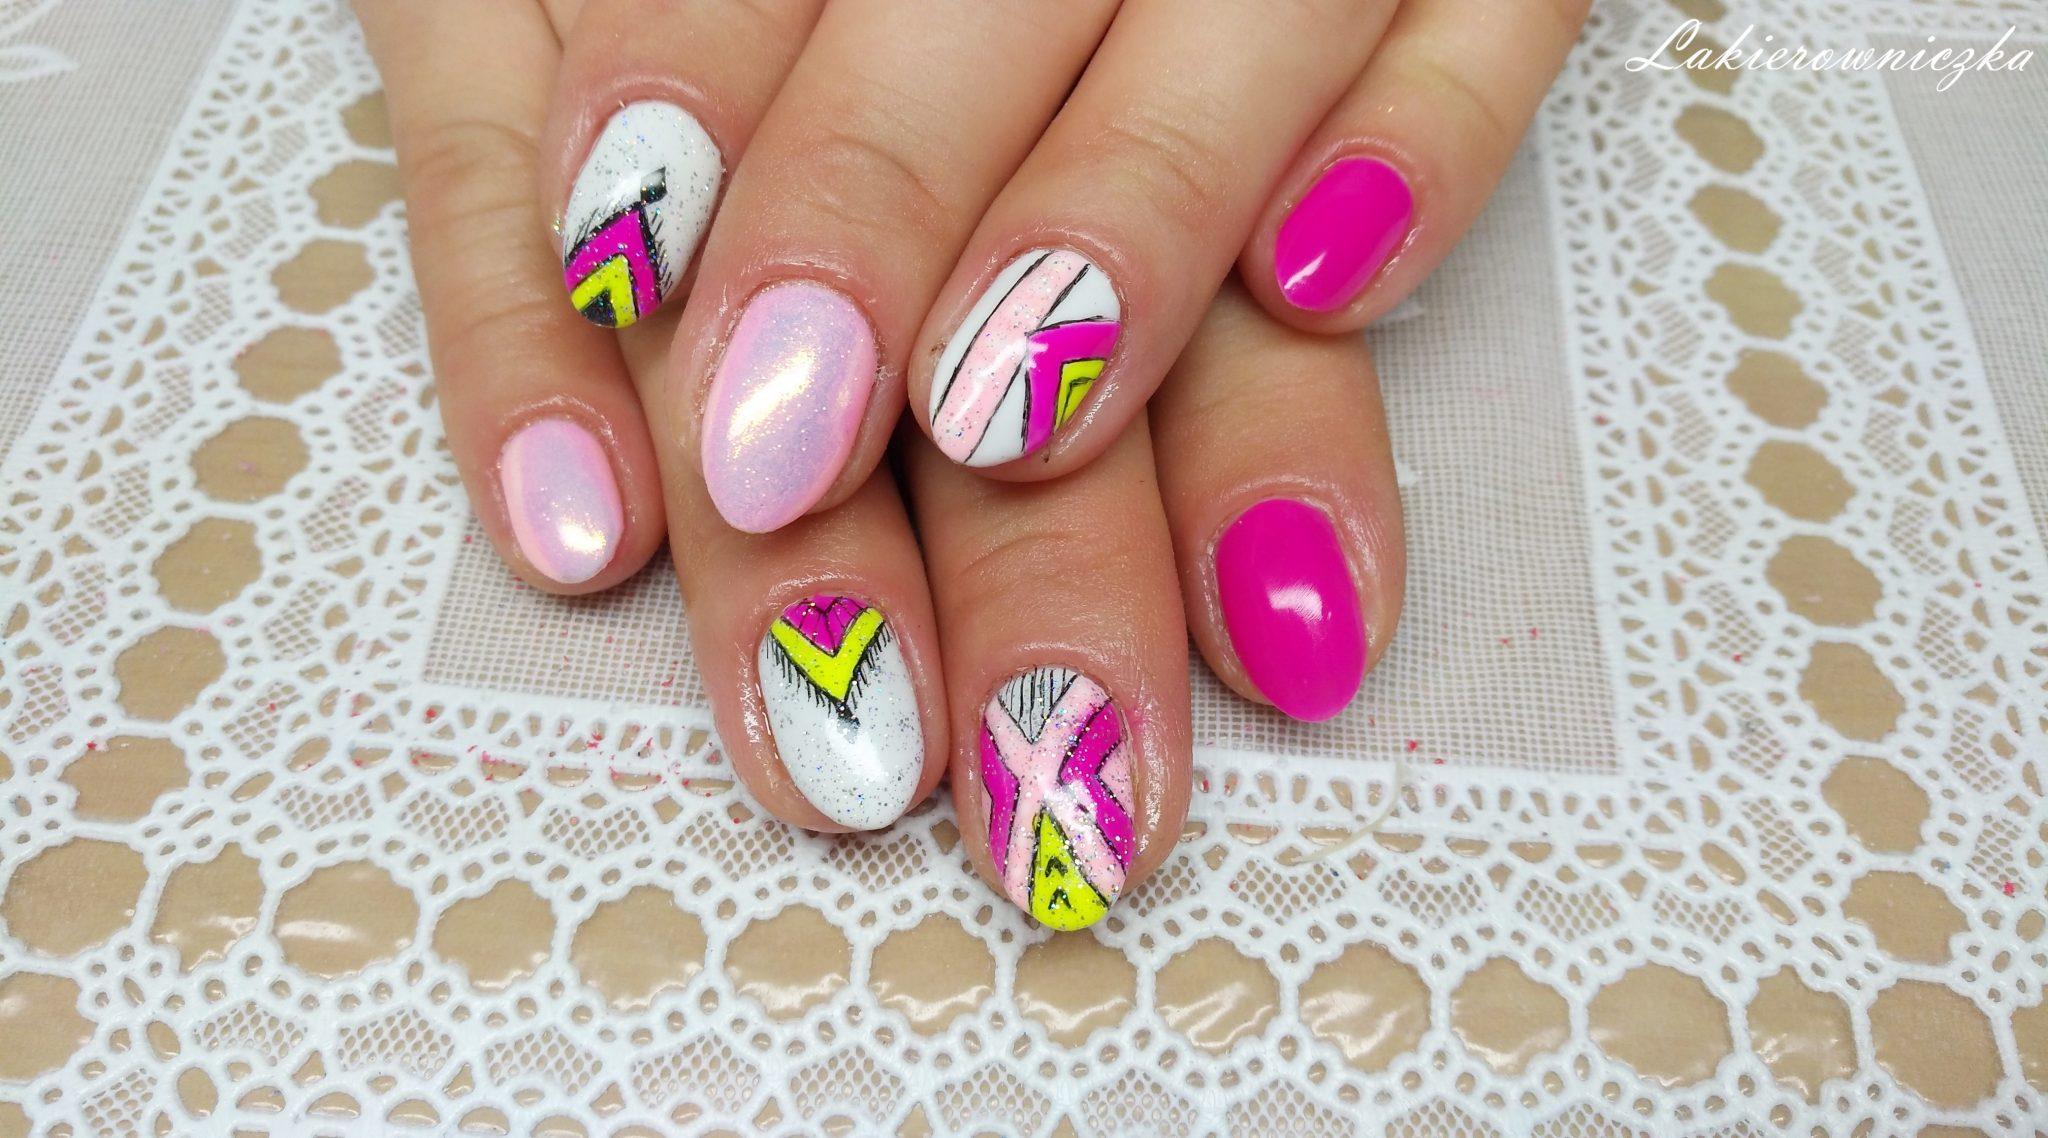 Hybryda Neonowy Roz I Zolty Neon Semilac 008 Intensive Pink I Dvn 125